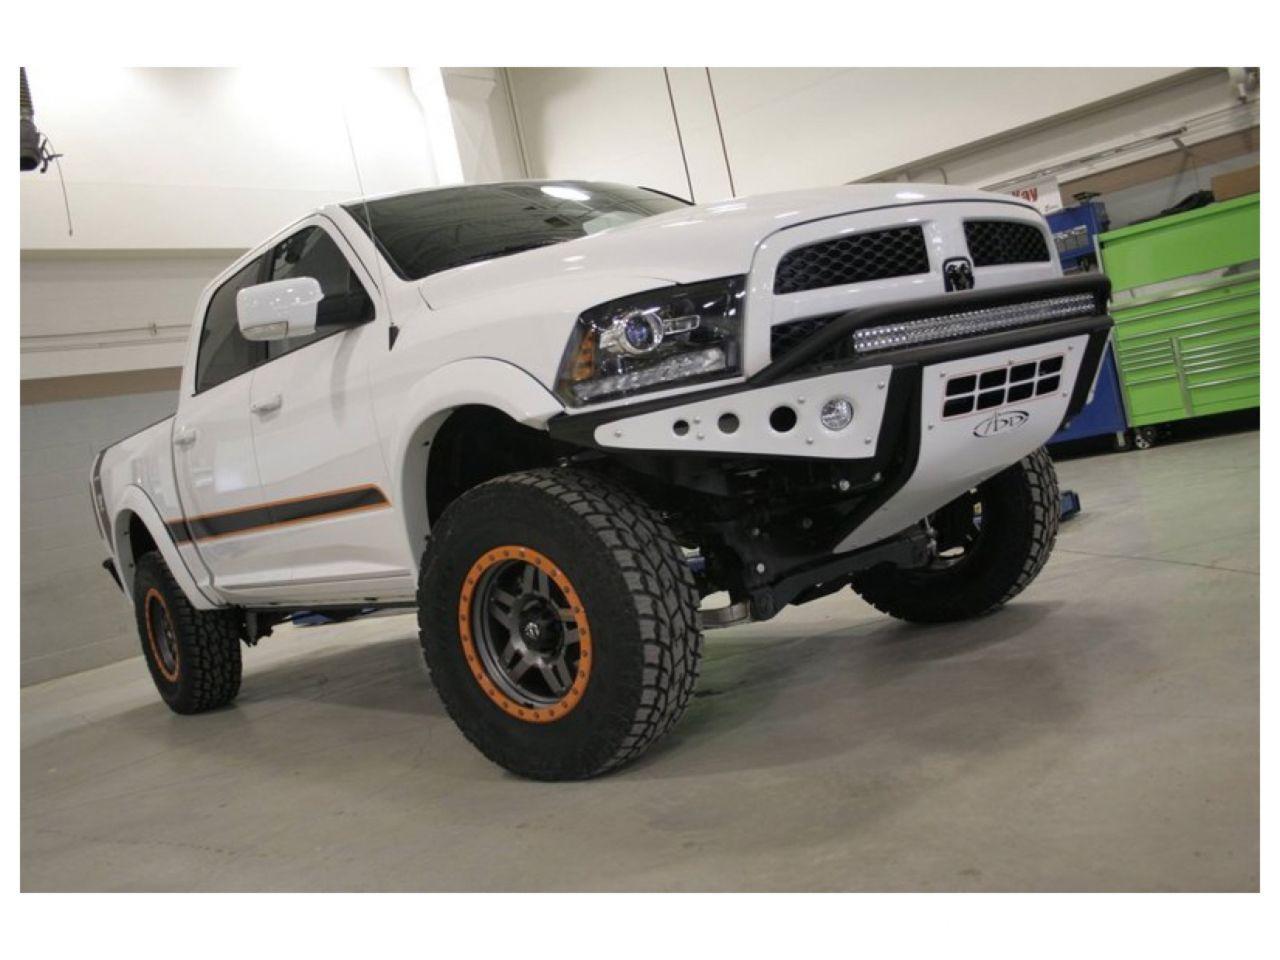 Addictive Desert Designs 09 18 Dodge Ram 1500 Stealth Front Bumper In 2021 Dodge Ram 1500 Dodge Ram Dodge Ram 1500 Accessories